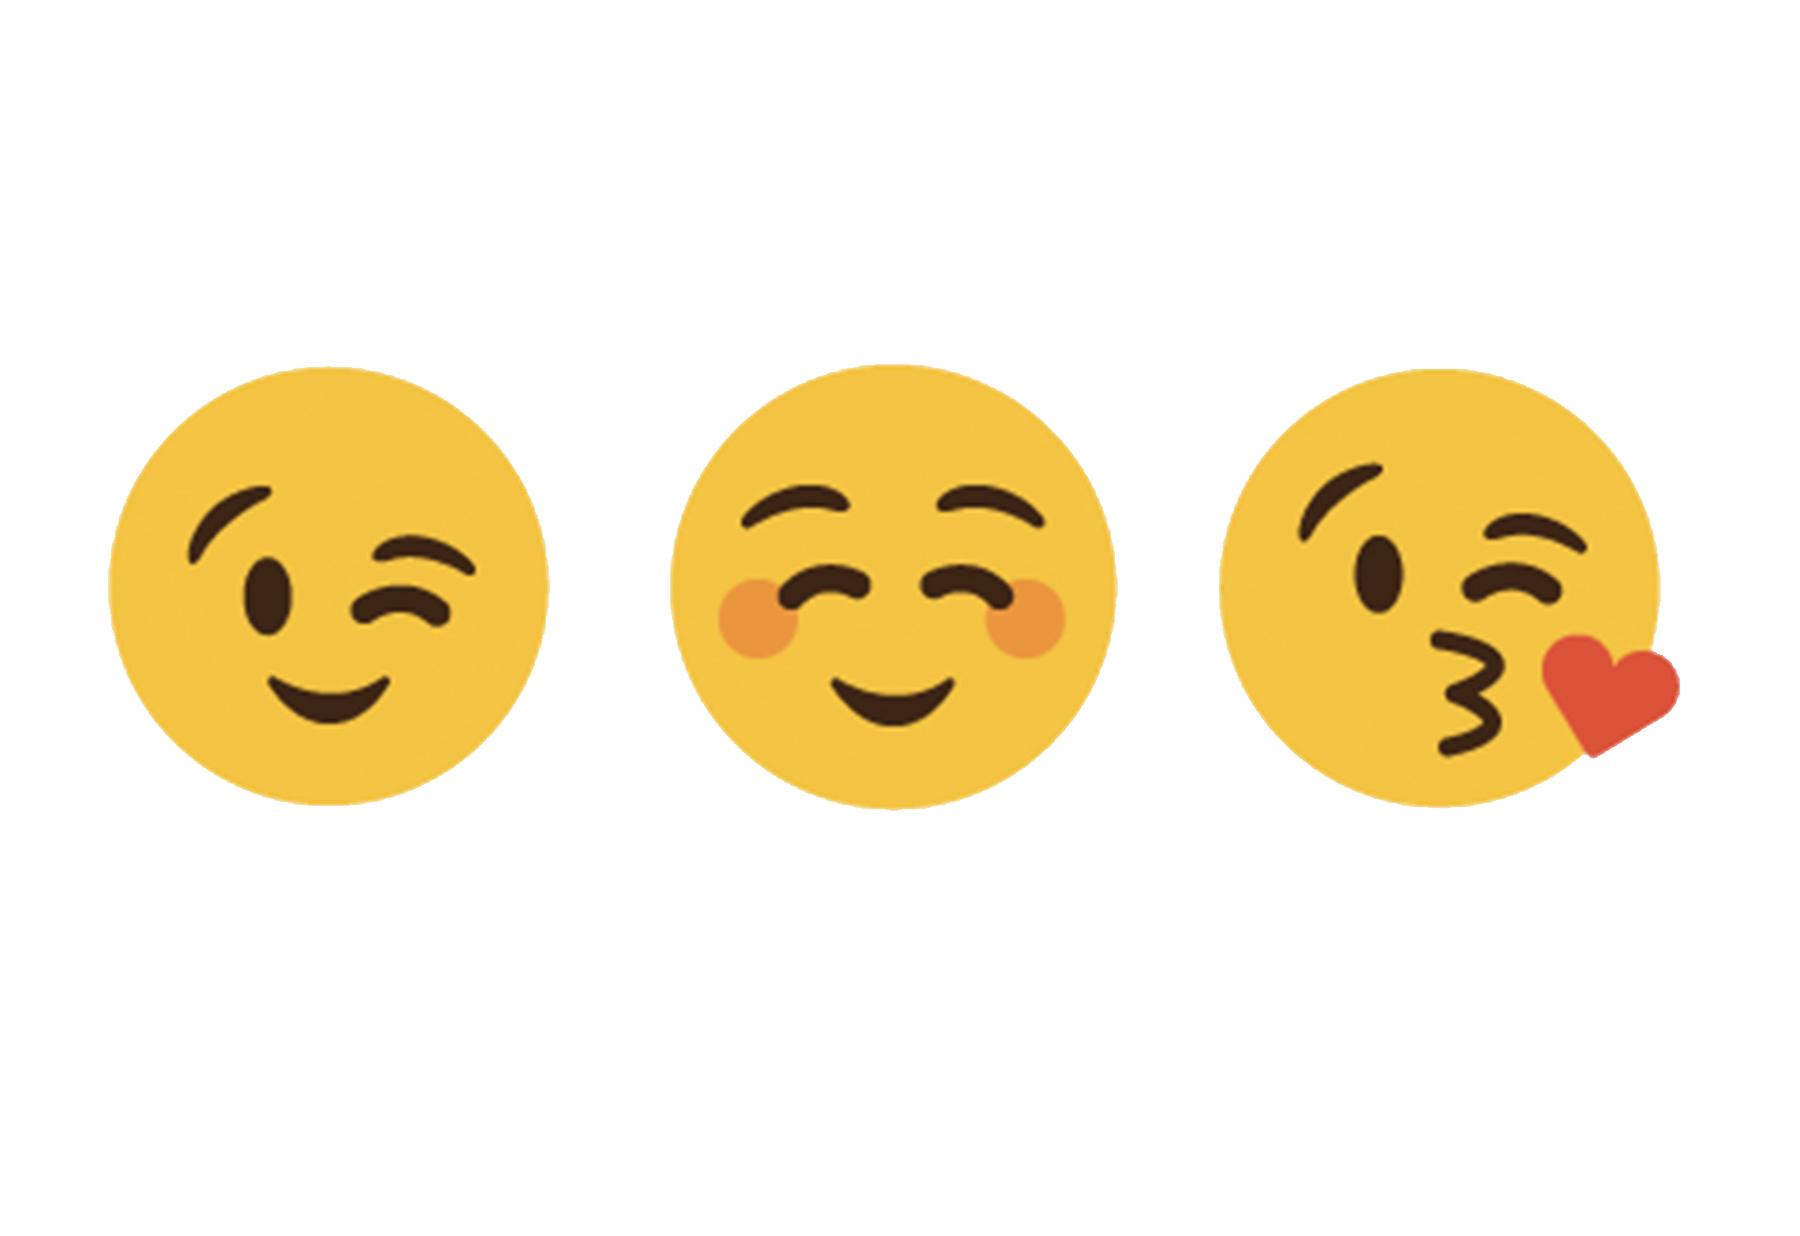 Match.com Survey Says Emoji Users Have More Sex